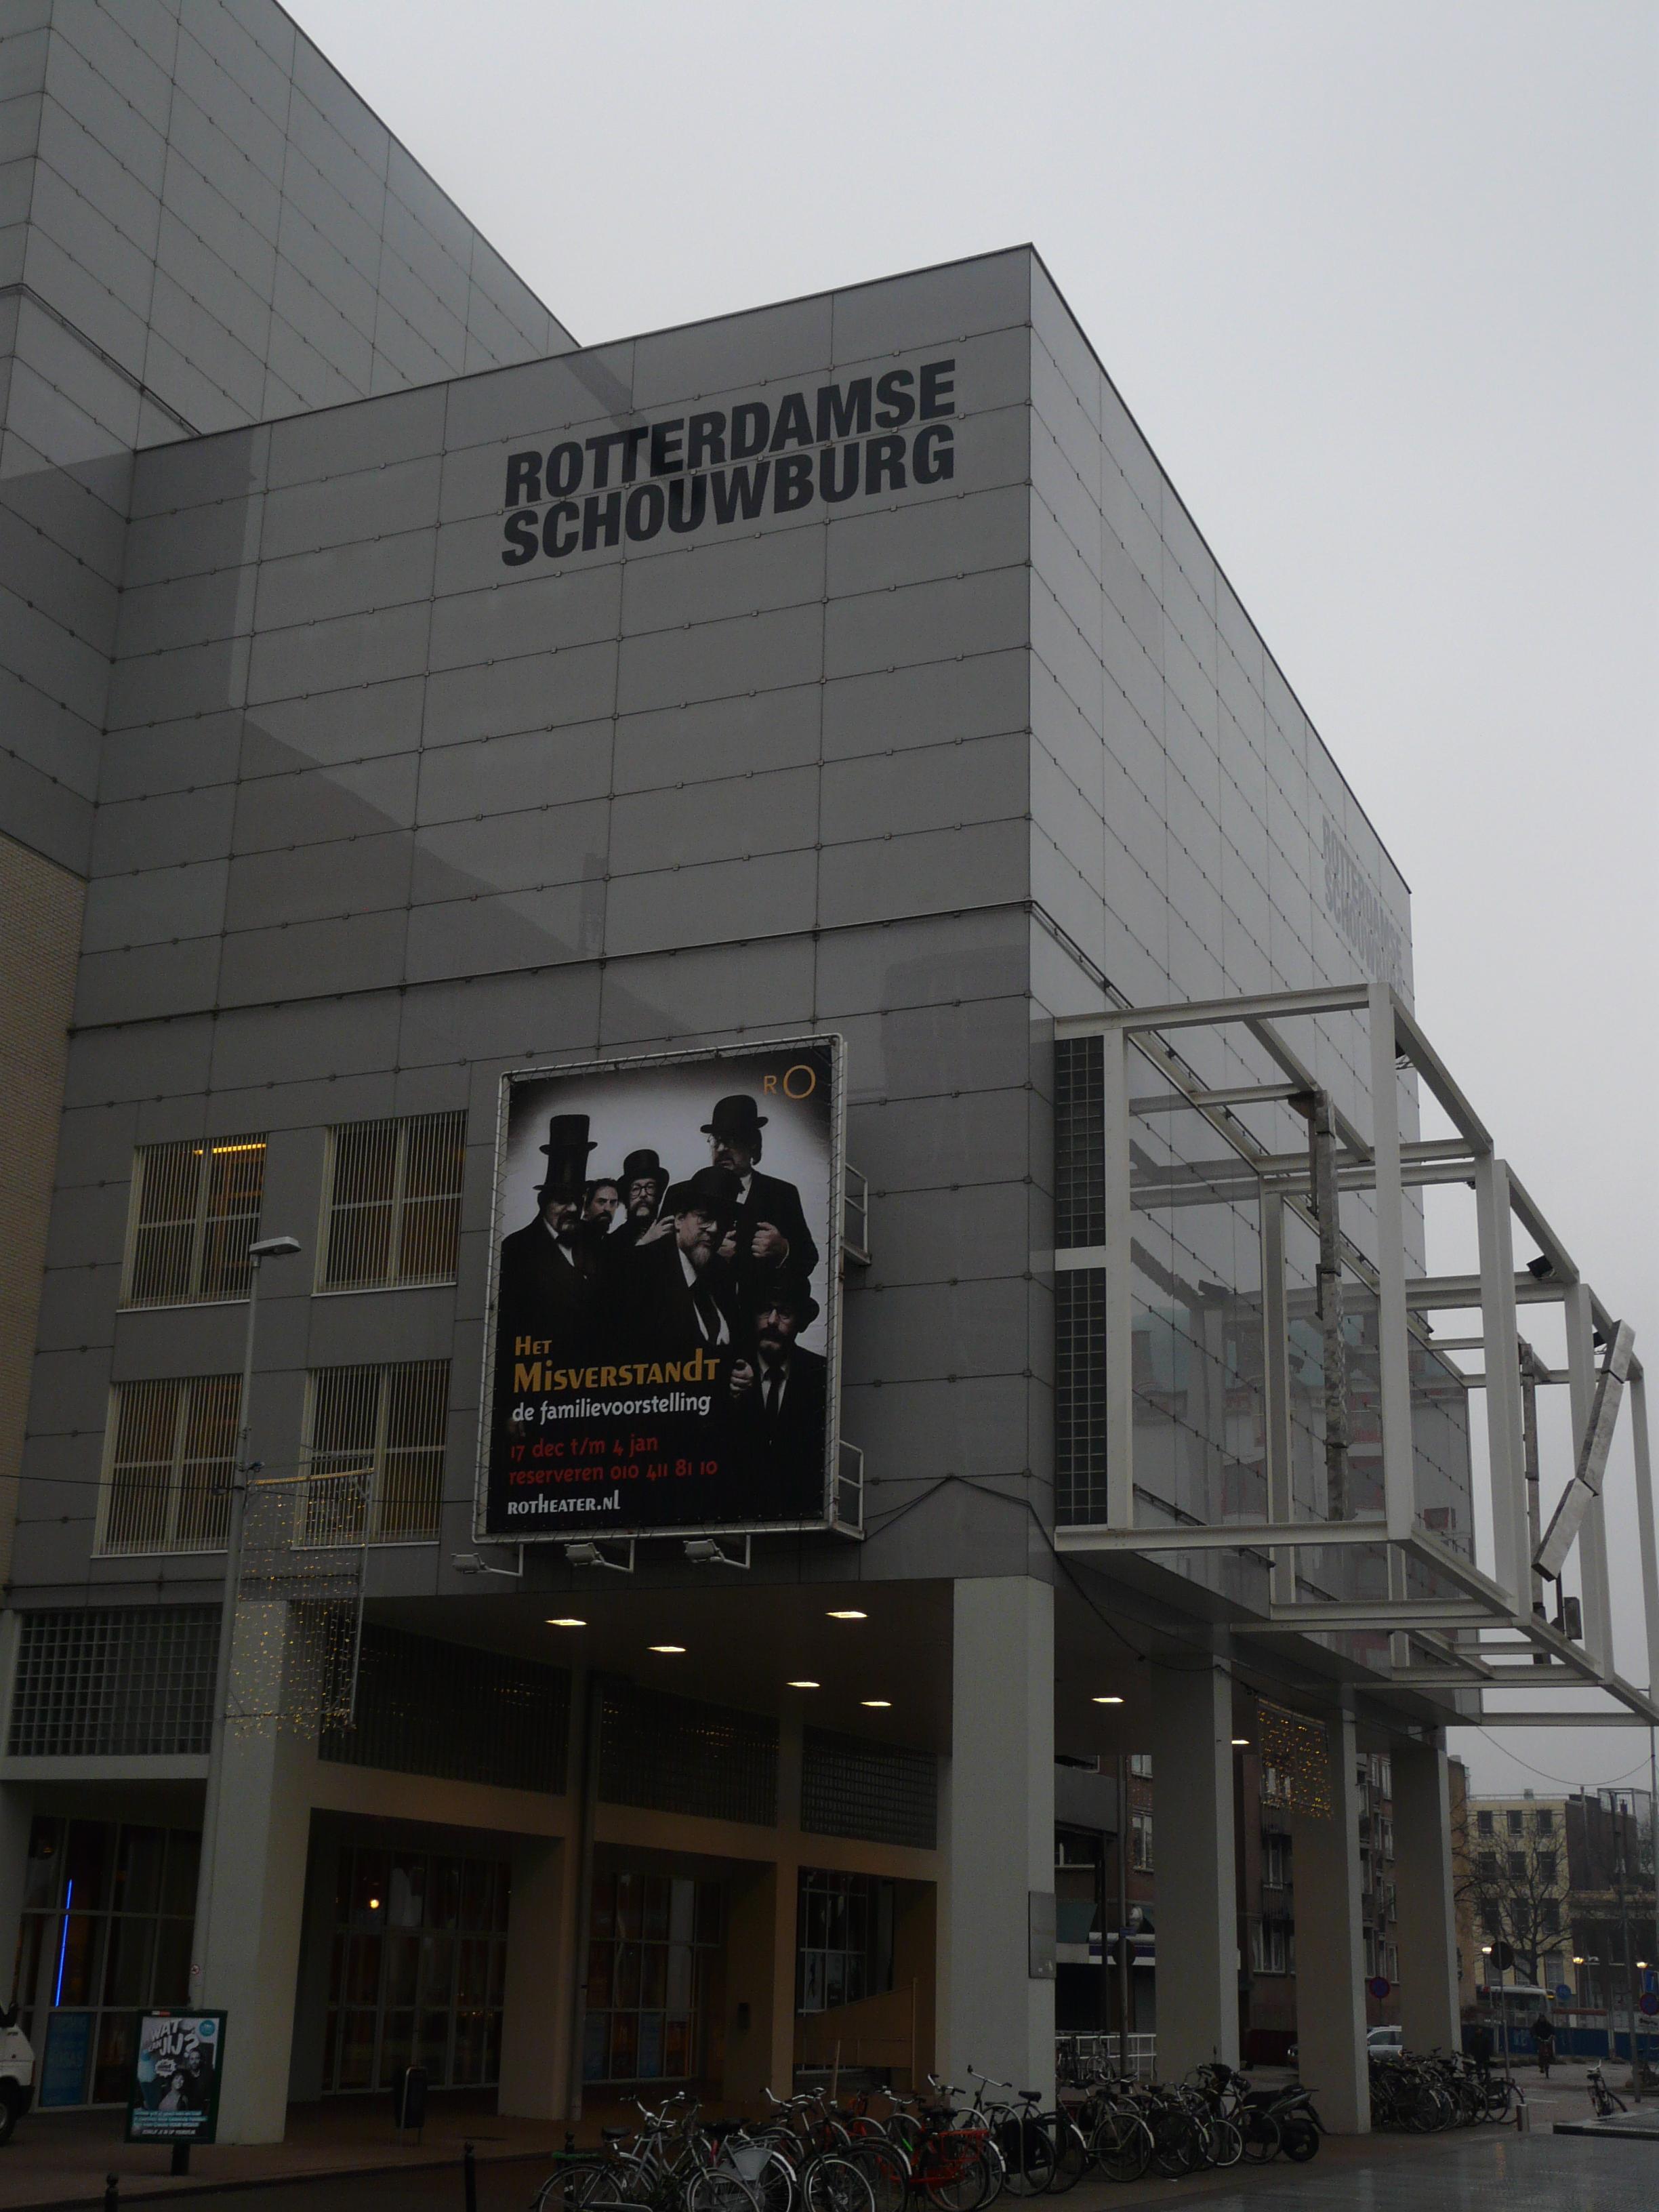 Theater Rotterdam Schouwburg (Rotterdam)